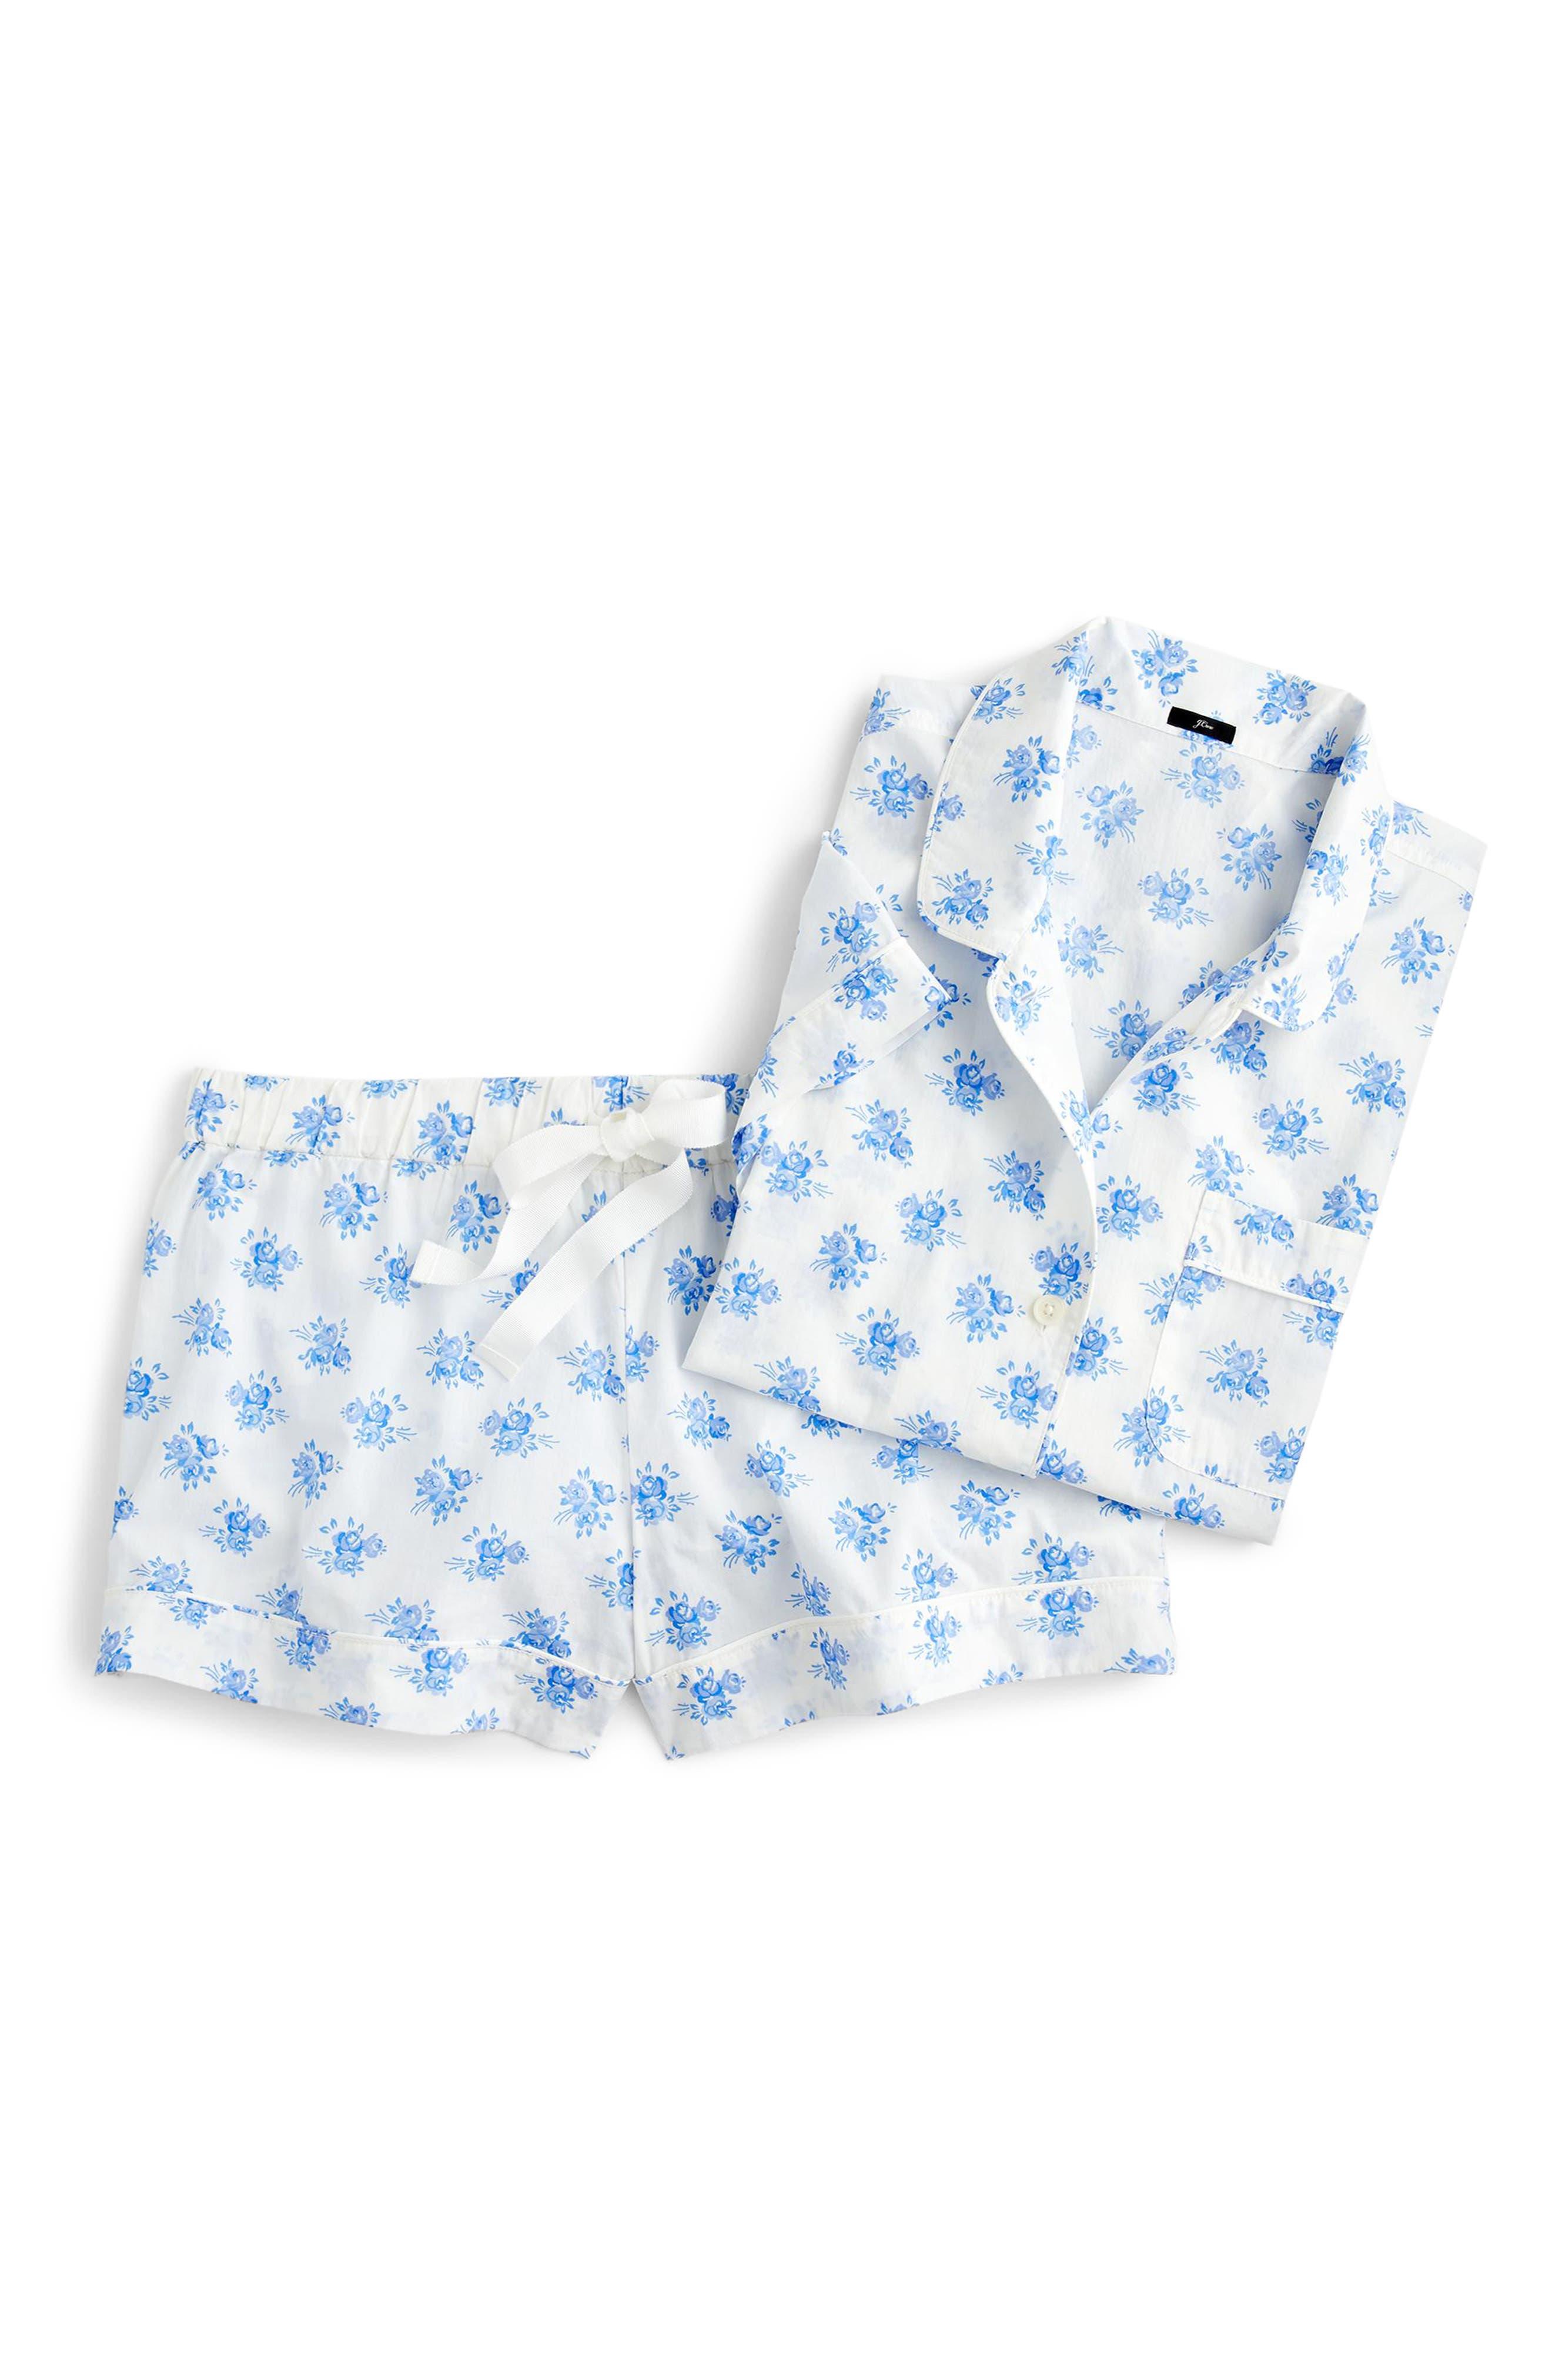 Sweet Pea Pajamas,                             Alternate thumbnail 3, color,                             900